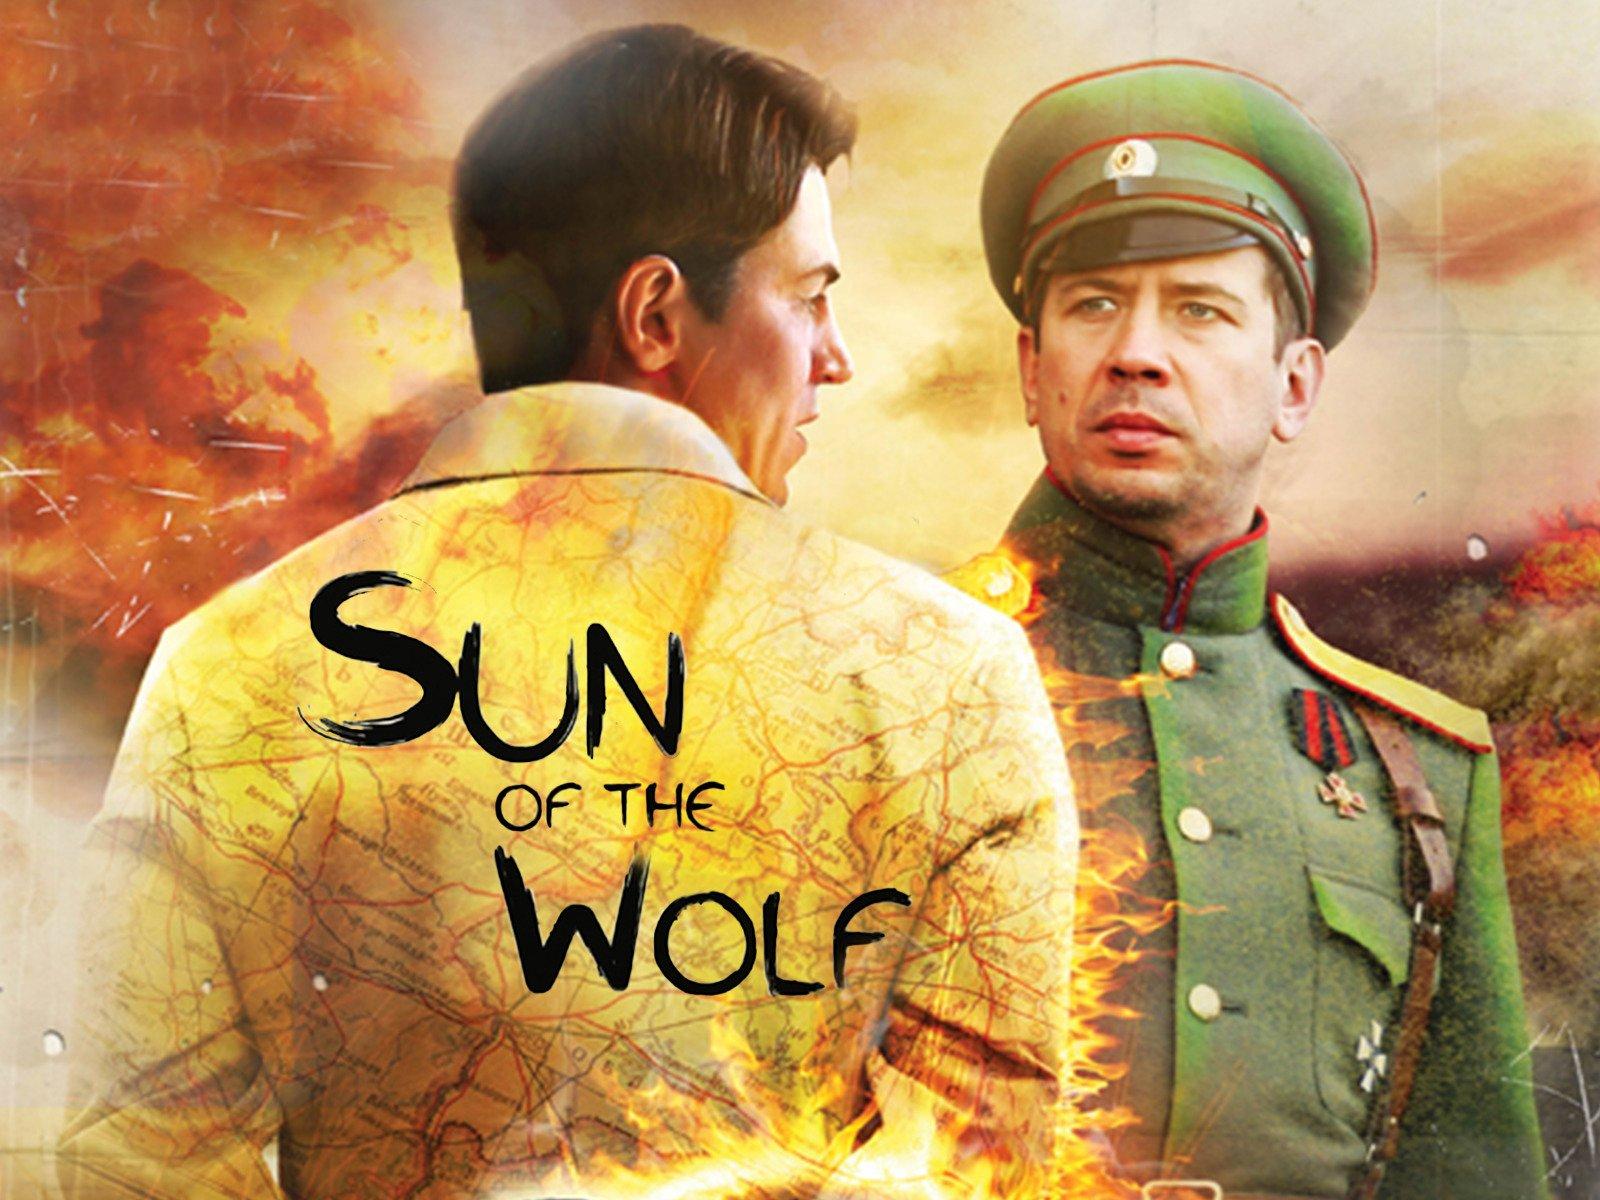 Sun of the Wolf